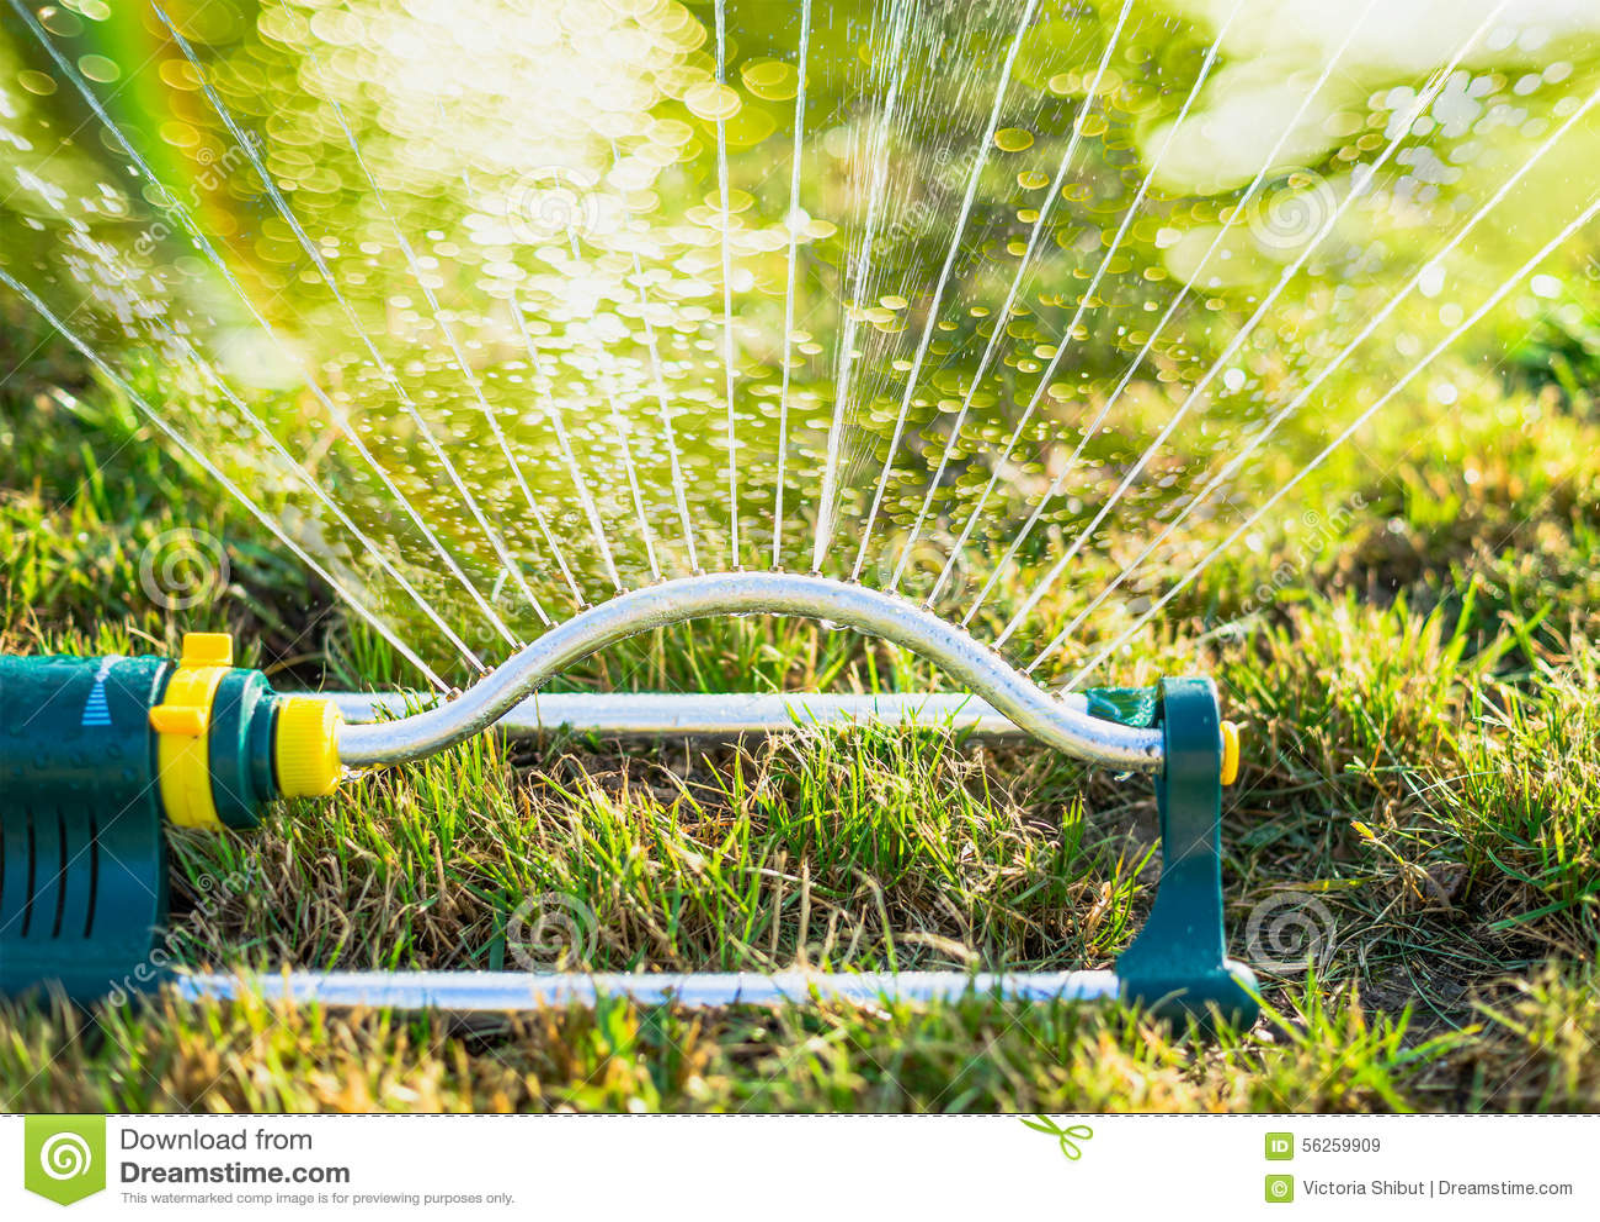 Watering in summer garden with sprinkler on grass lawn background